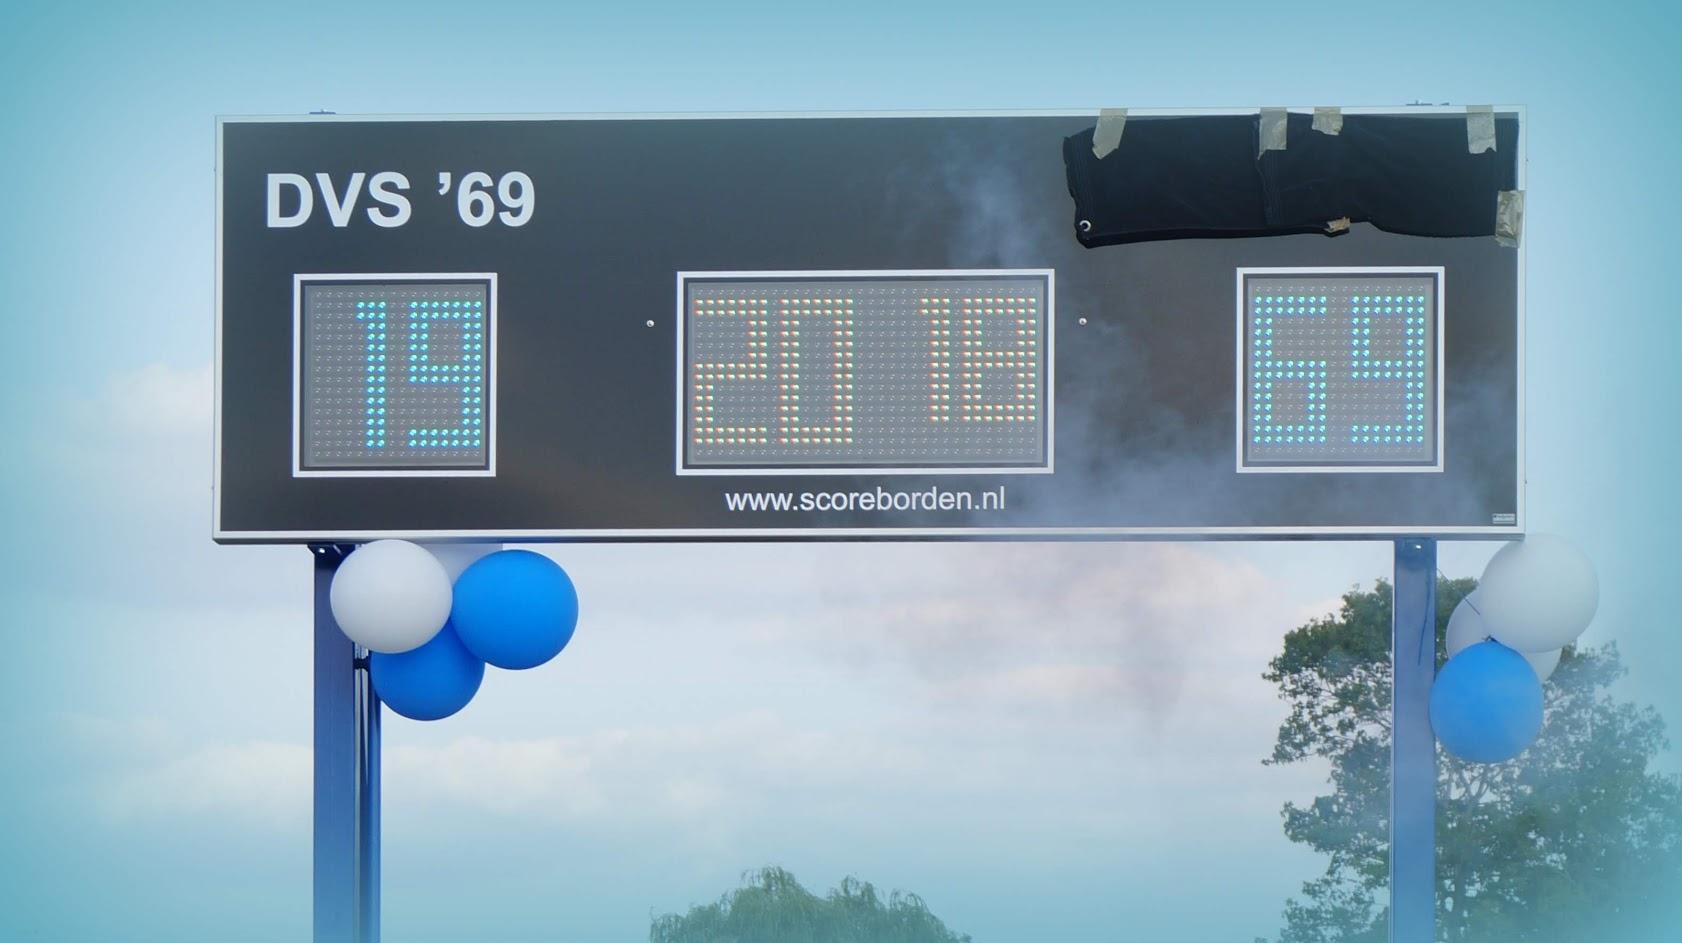 Nieuwe scorebord werd onthuld